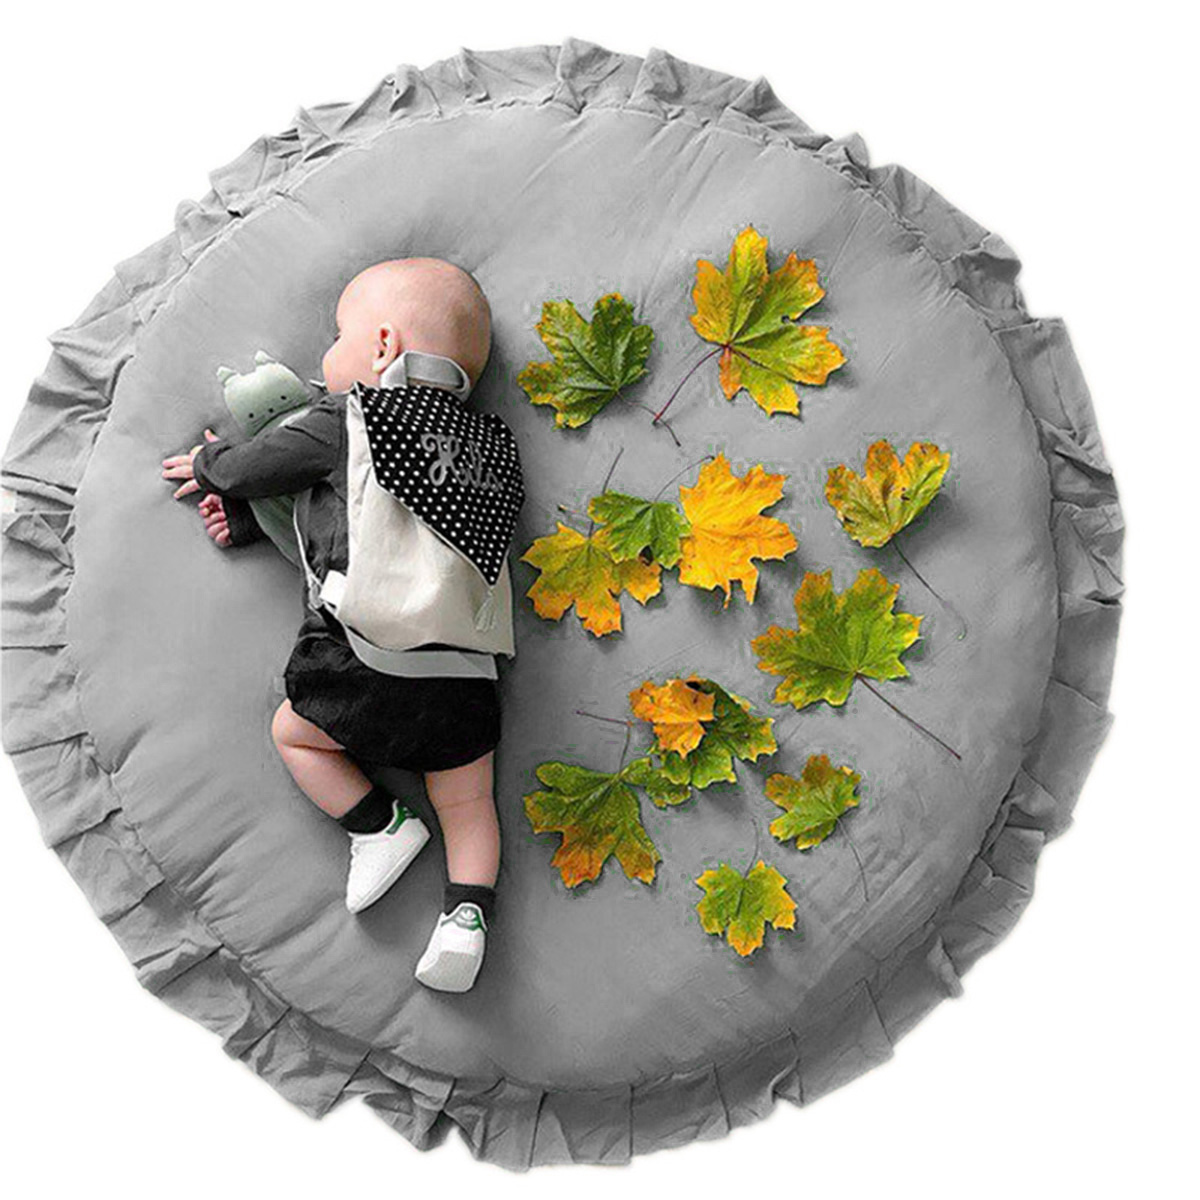 Animal Print Baby Play Mat Kid Rug Shower Gift Nursery Decor tummy time Baby Rug